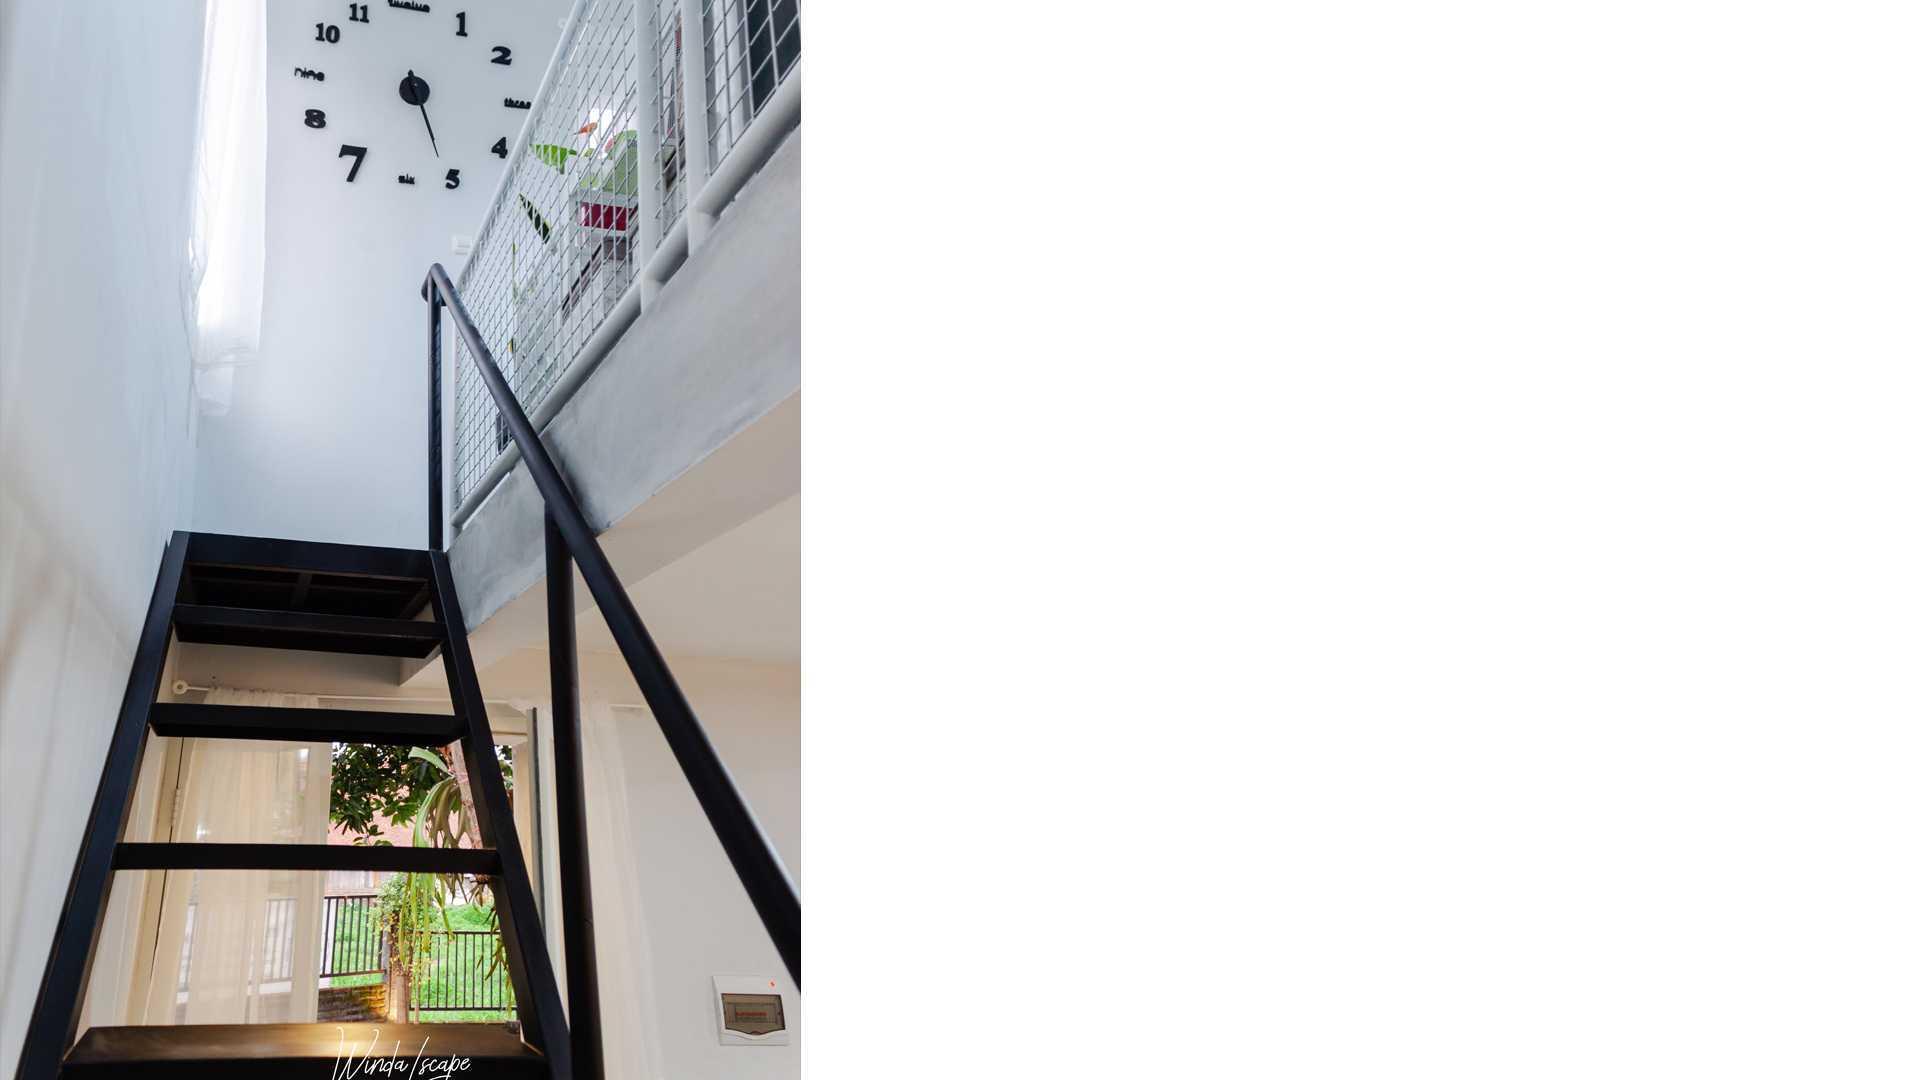 Mr Arsitek G Office   Kantor Mungil Di Semarang Jl. Sendang Pakel I No.30, Gedawang, Kec. Banyumanik, Kota Semarang, Jawa Tengah 50266, Indonesia Jl. Sendang Pakel I No.30, Gedawang, Kec. Banyumanik, Kota Semarang, Jawa Tengah 50266, Indonesia Mr-Arsitek-G-Office-Kantor-Mungil-Di-Semarang Industrial Bagian Tangga G Office 108628